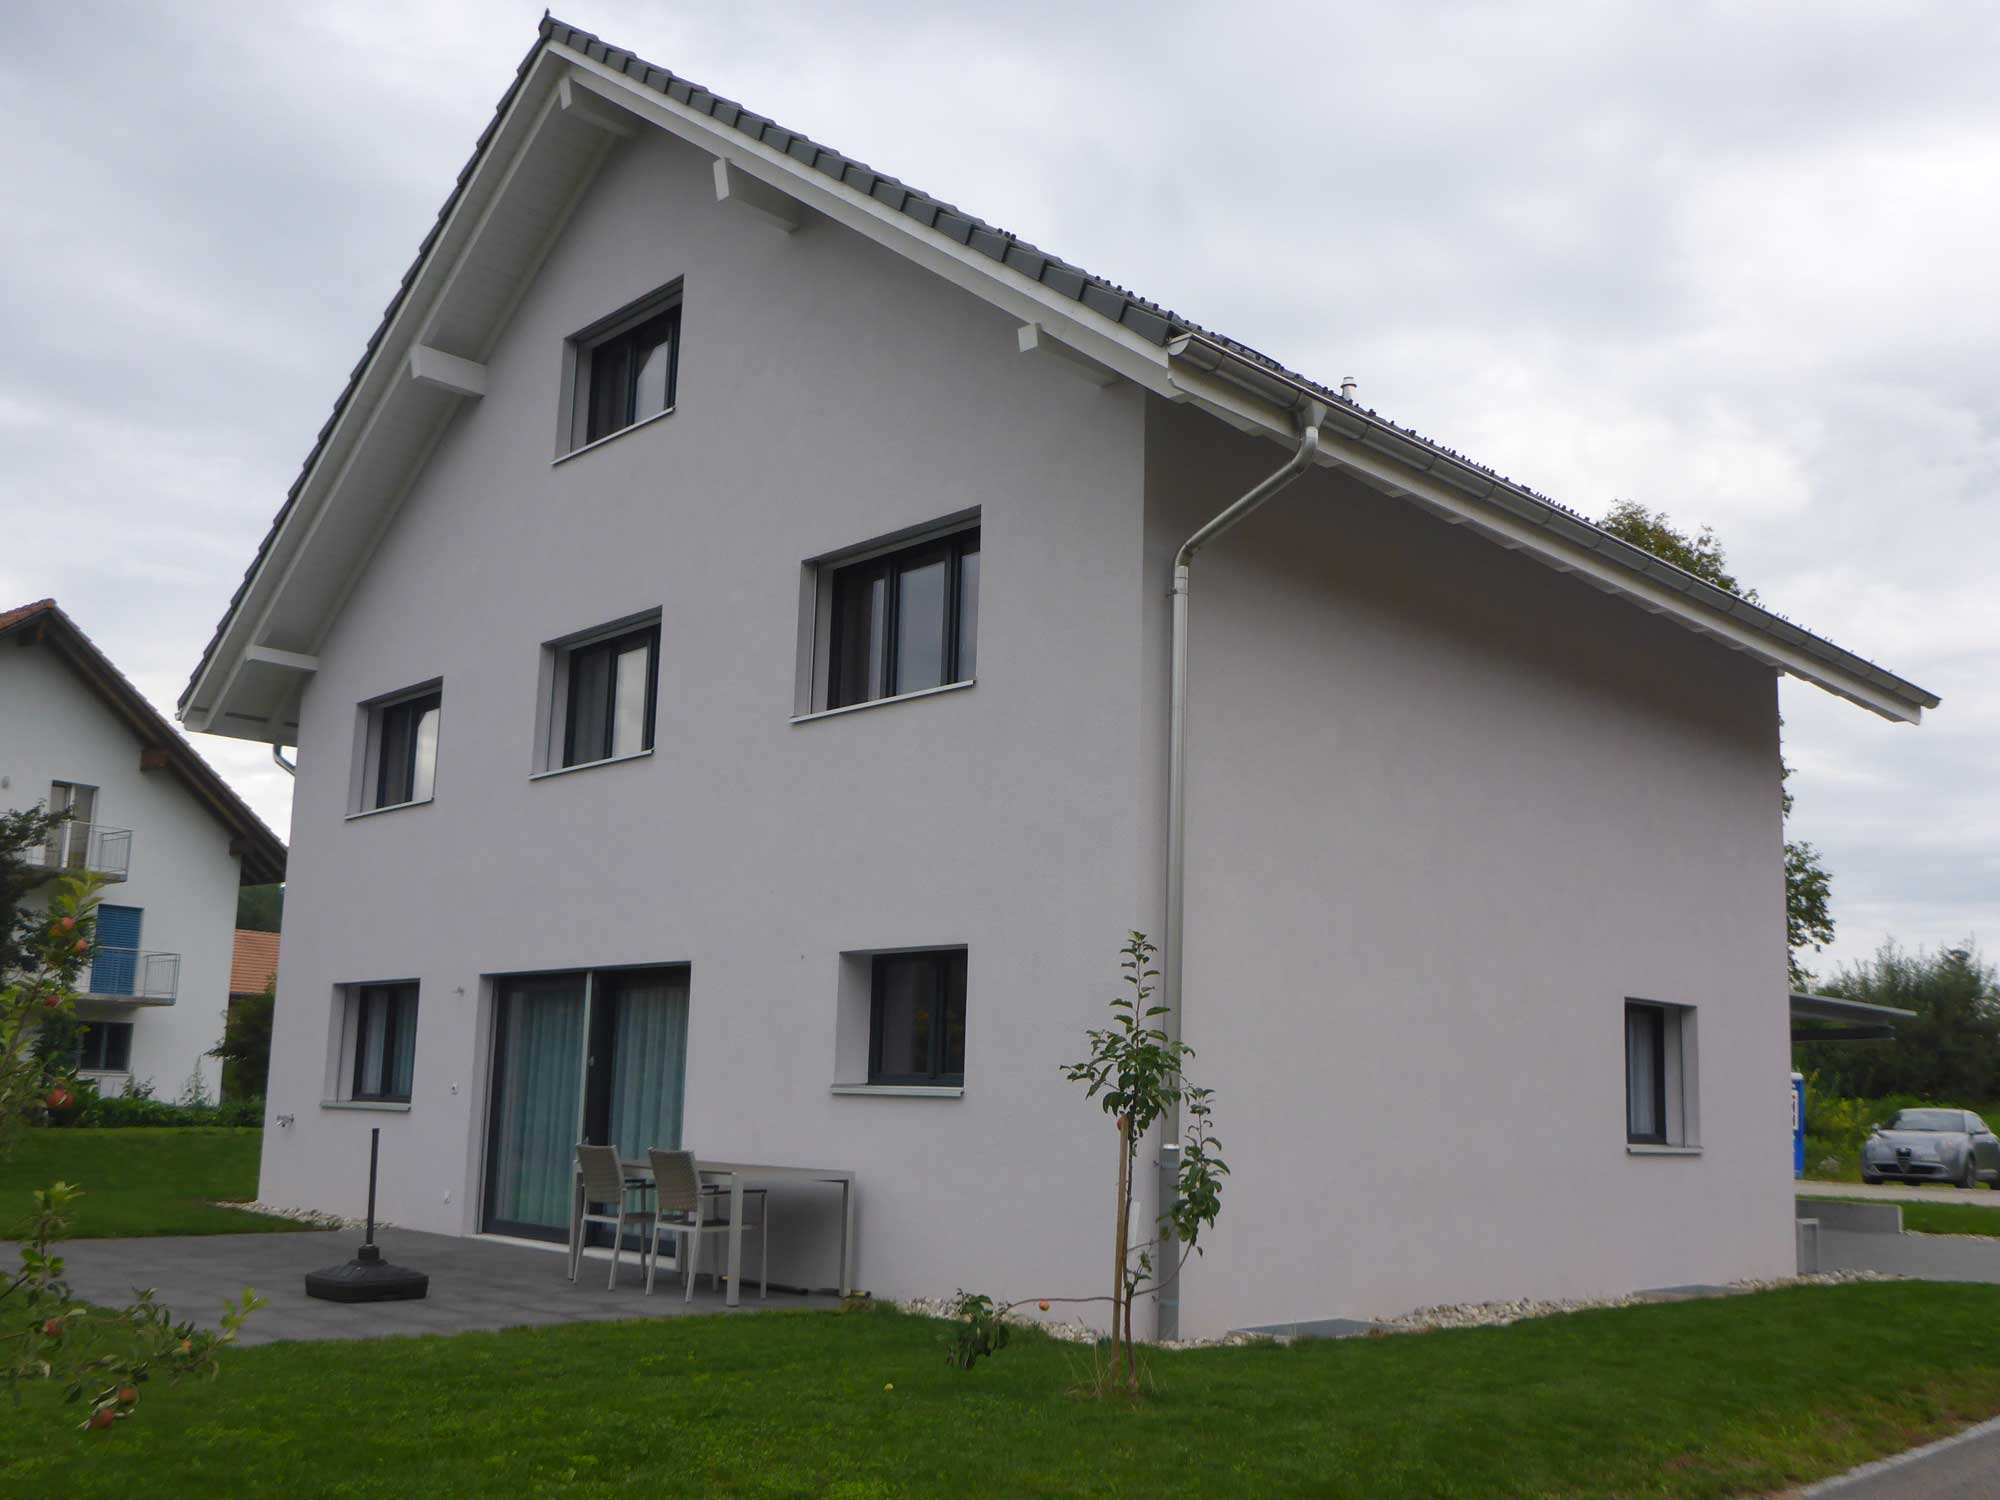 Musterhaus 1: 5½ - Zimmer - Einfamilienhaus